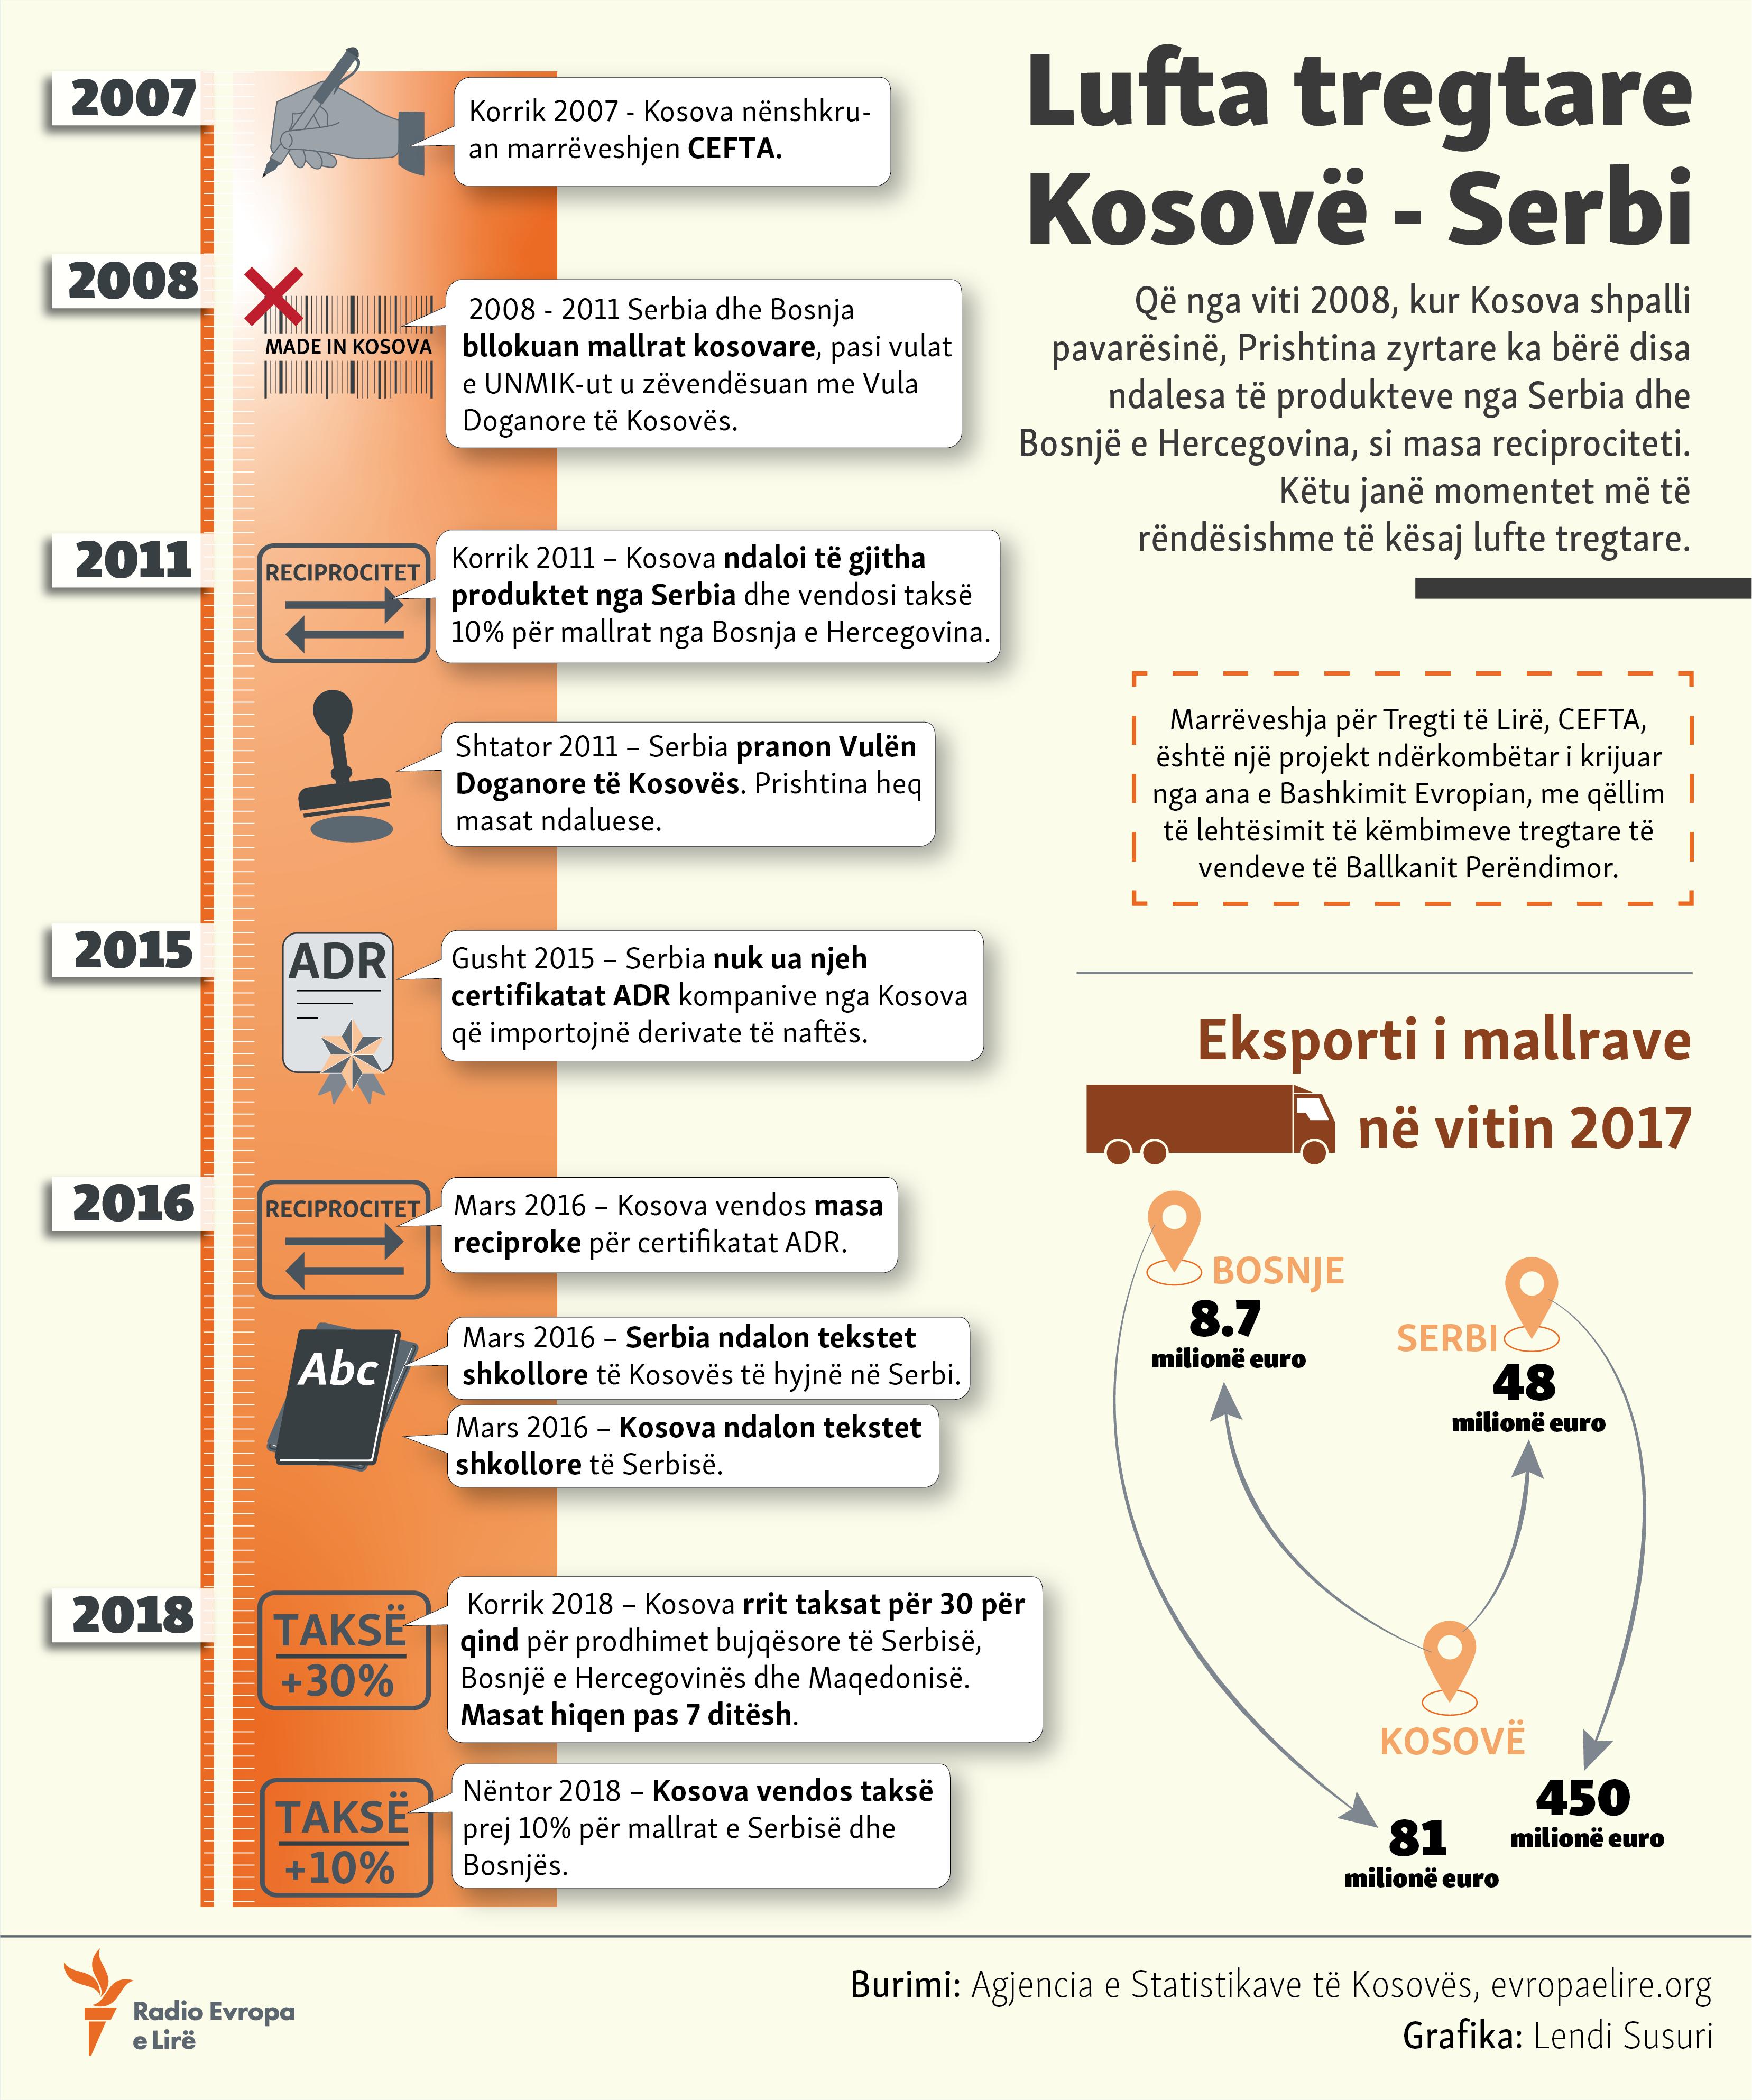 Lufta Tregtare Kosove Serbi